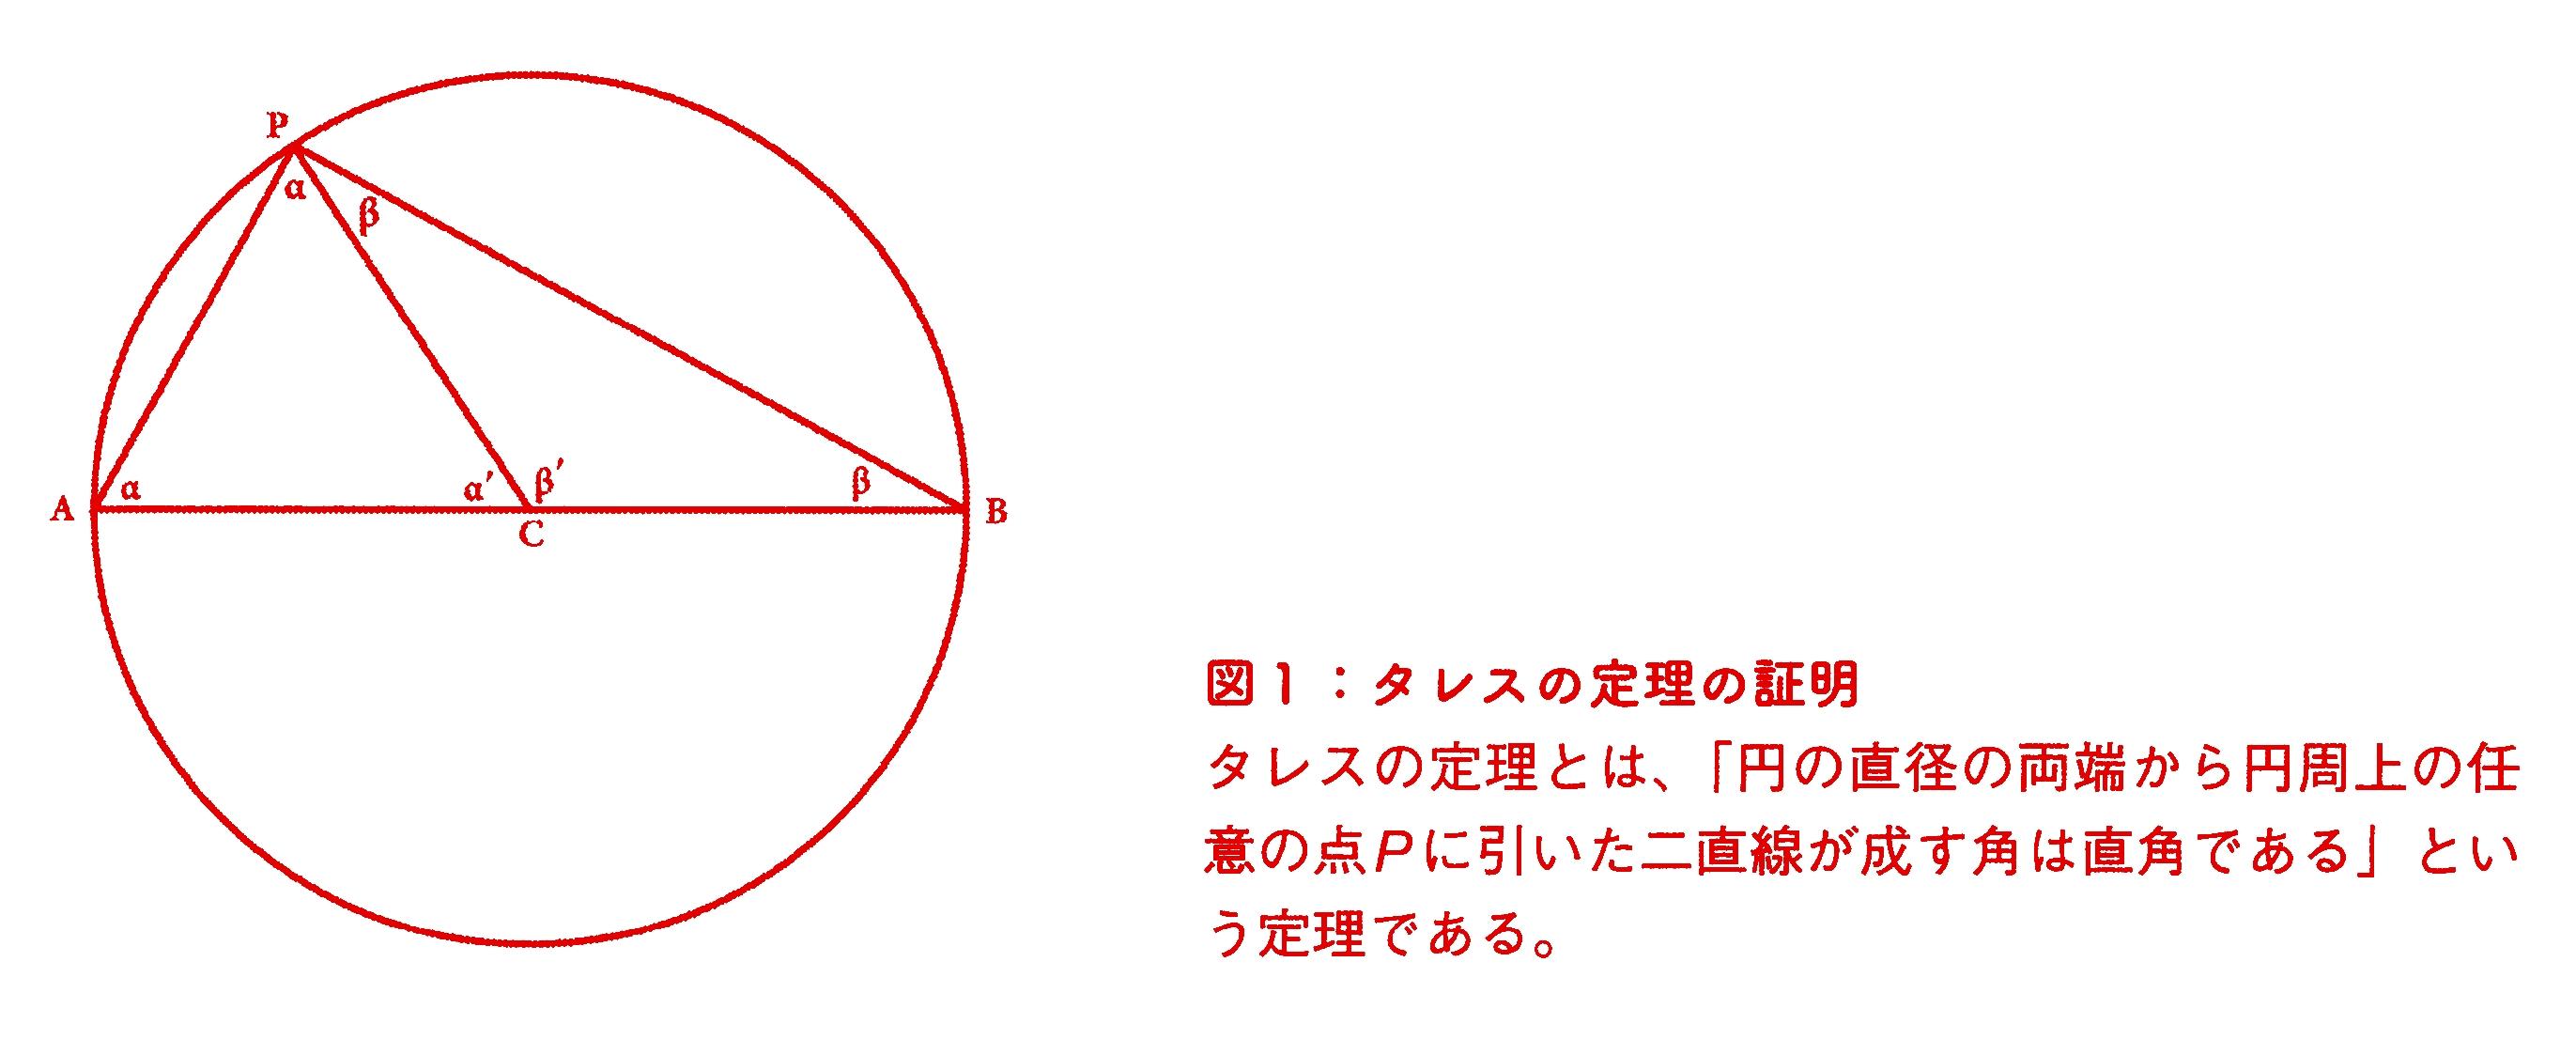 Thalēs_theorem_red